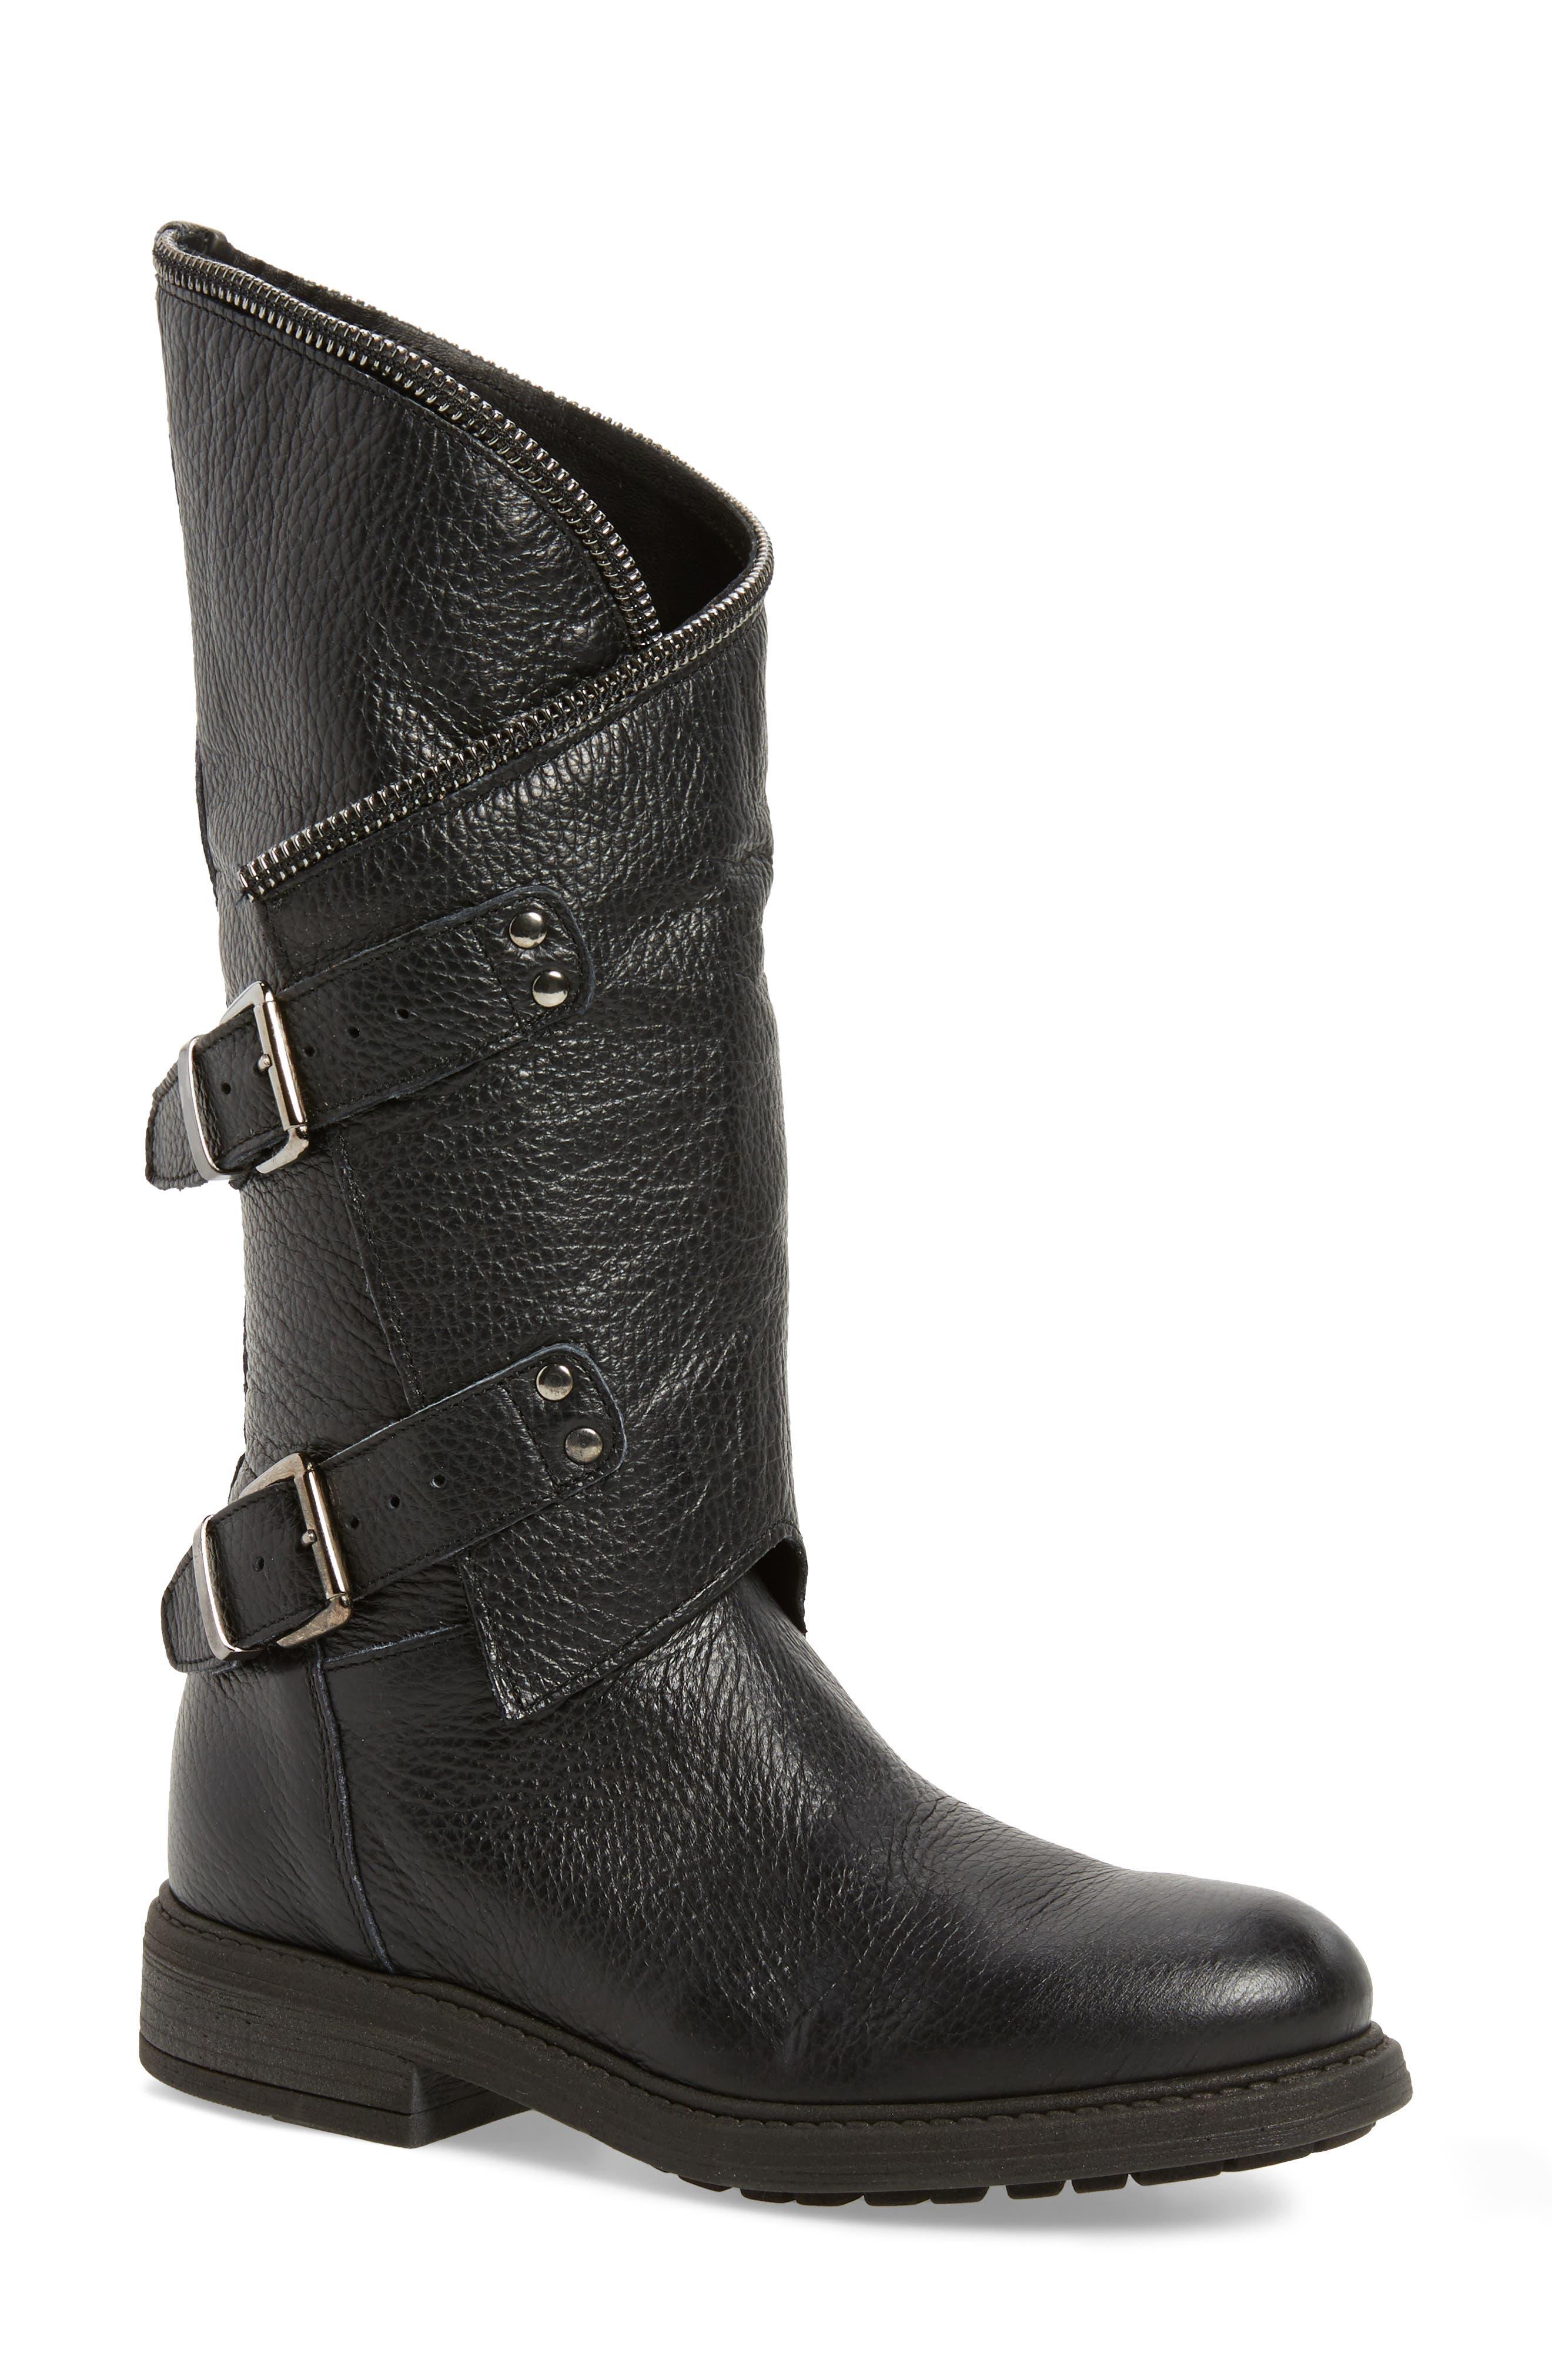 Alternate Image 1 Selected - Sheridan Mia Bray Asymmetrical Zip Boot (Women)